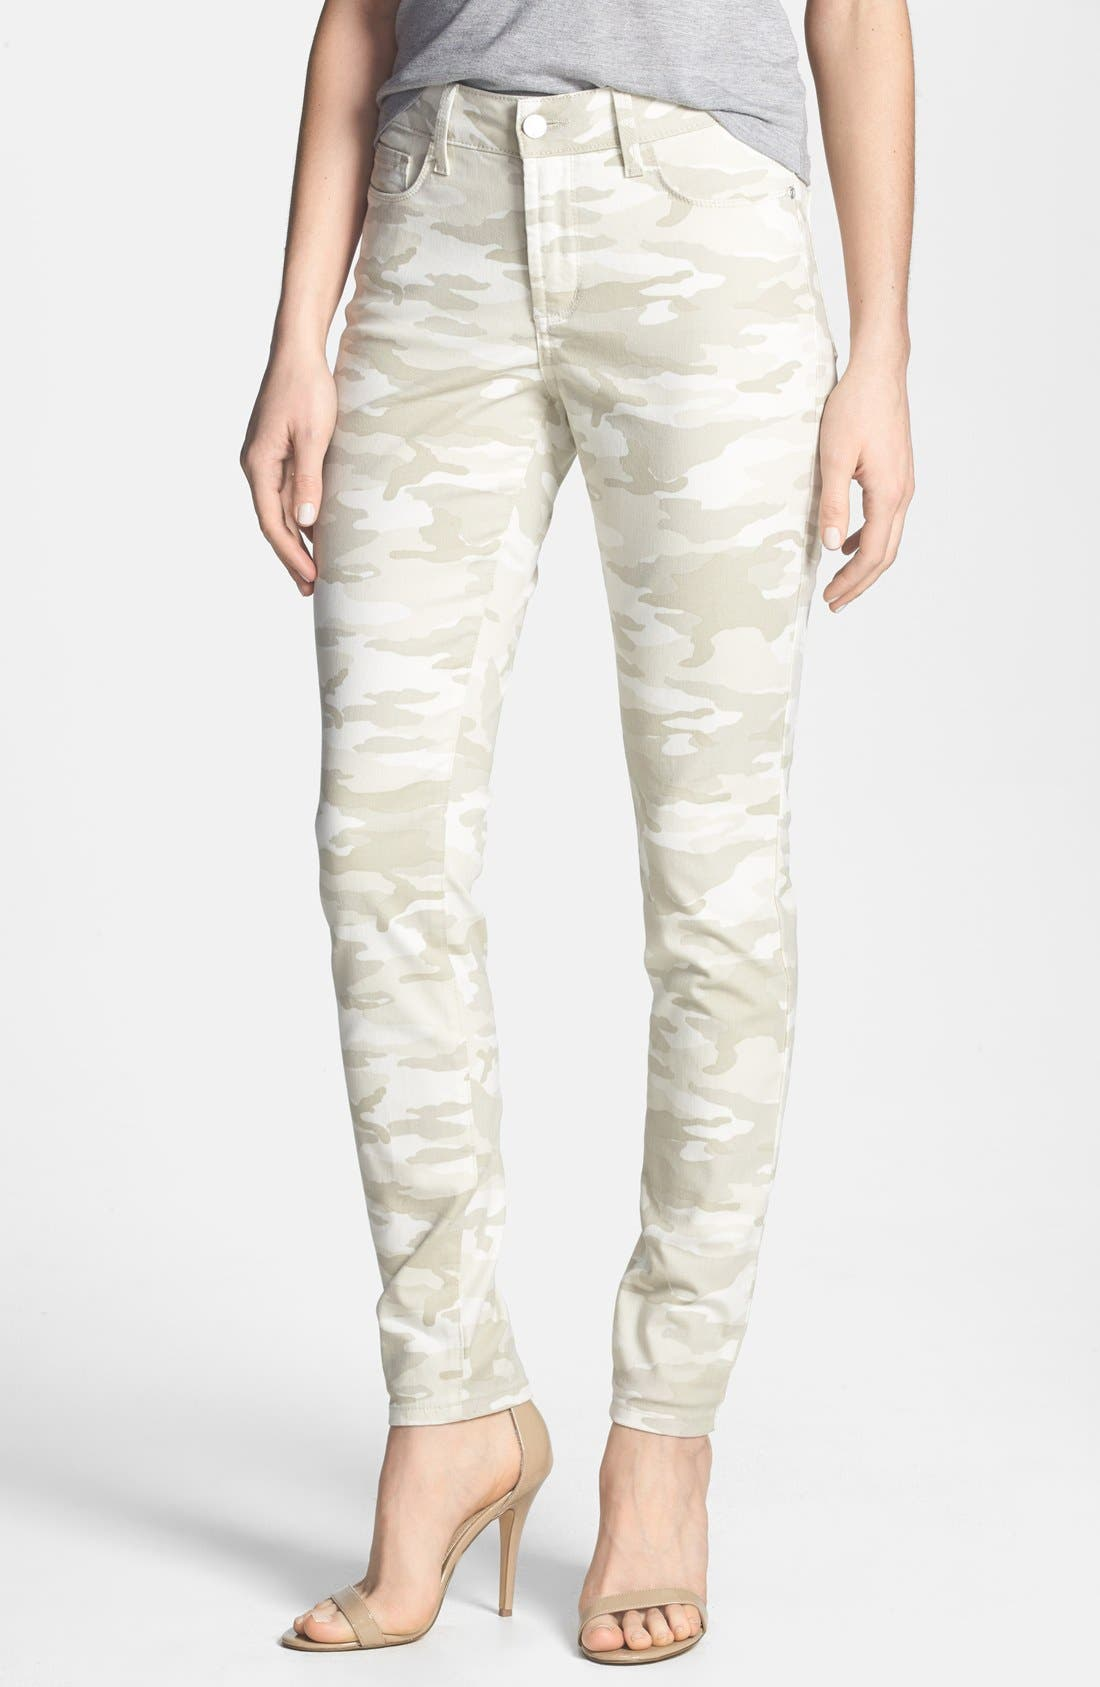 Main Image - NYDJ 'Ami' Camo Stretch Super Skinny Jeans (Regular & Petite)